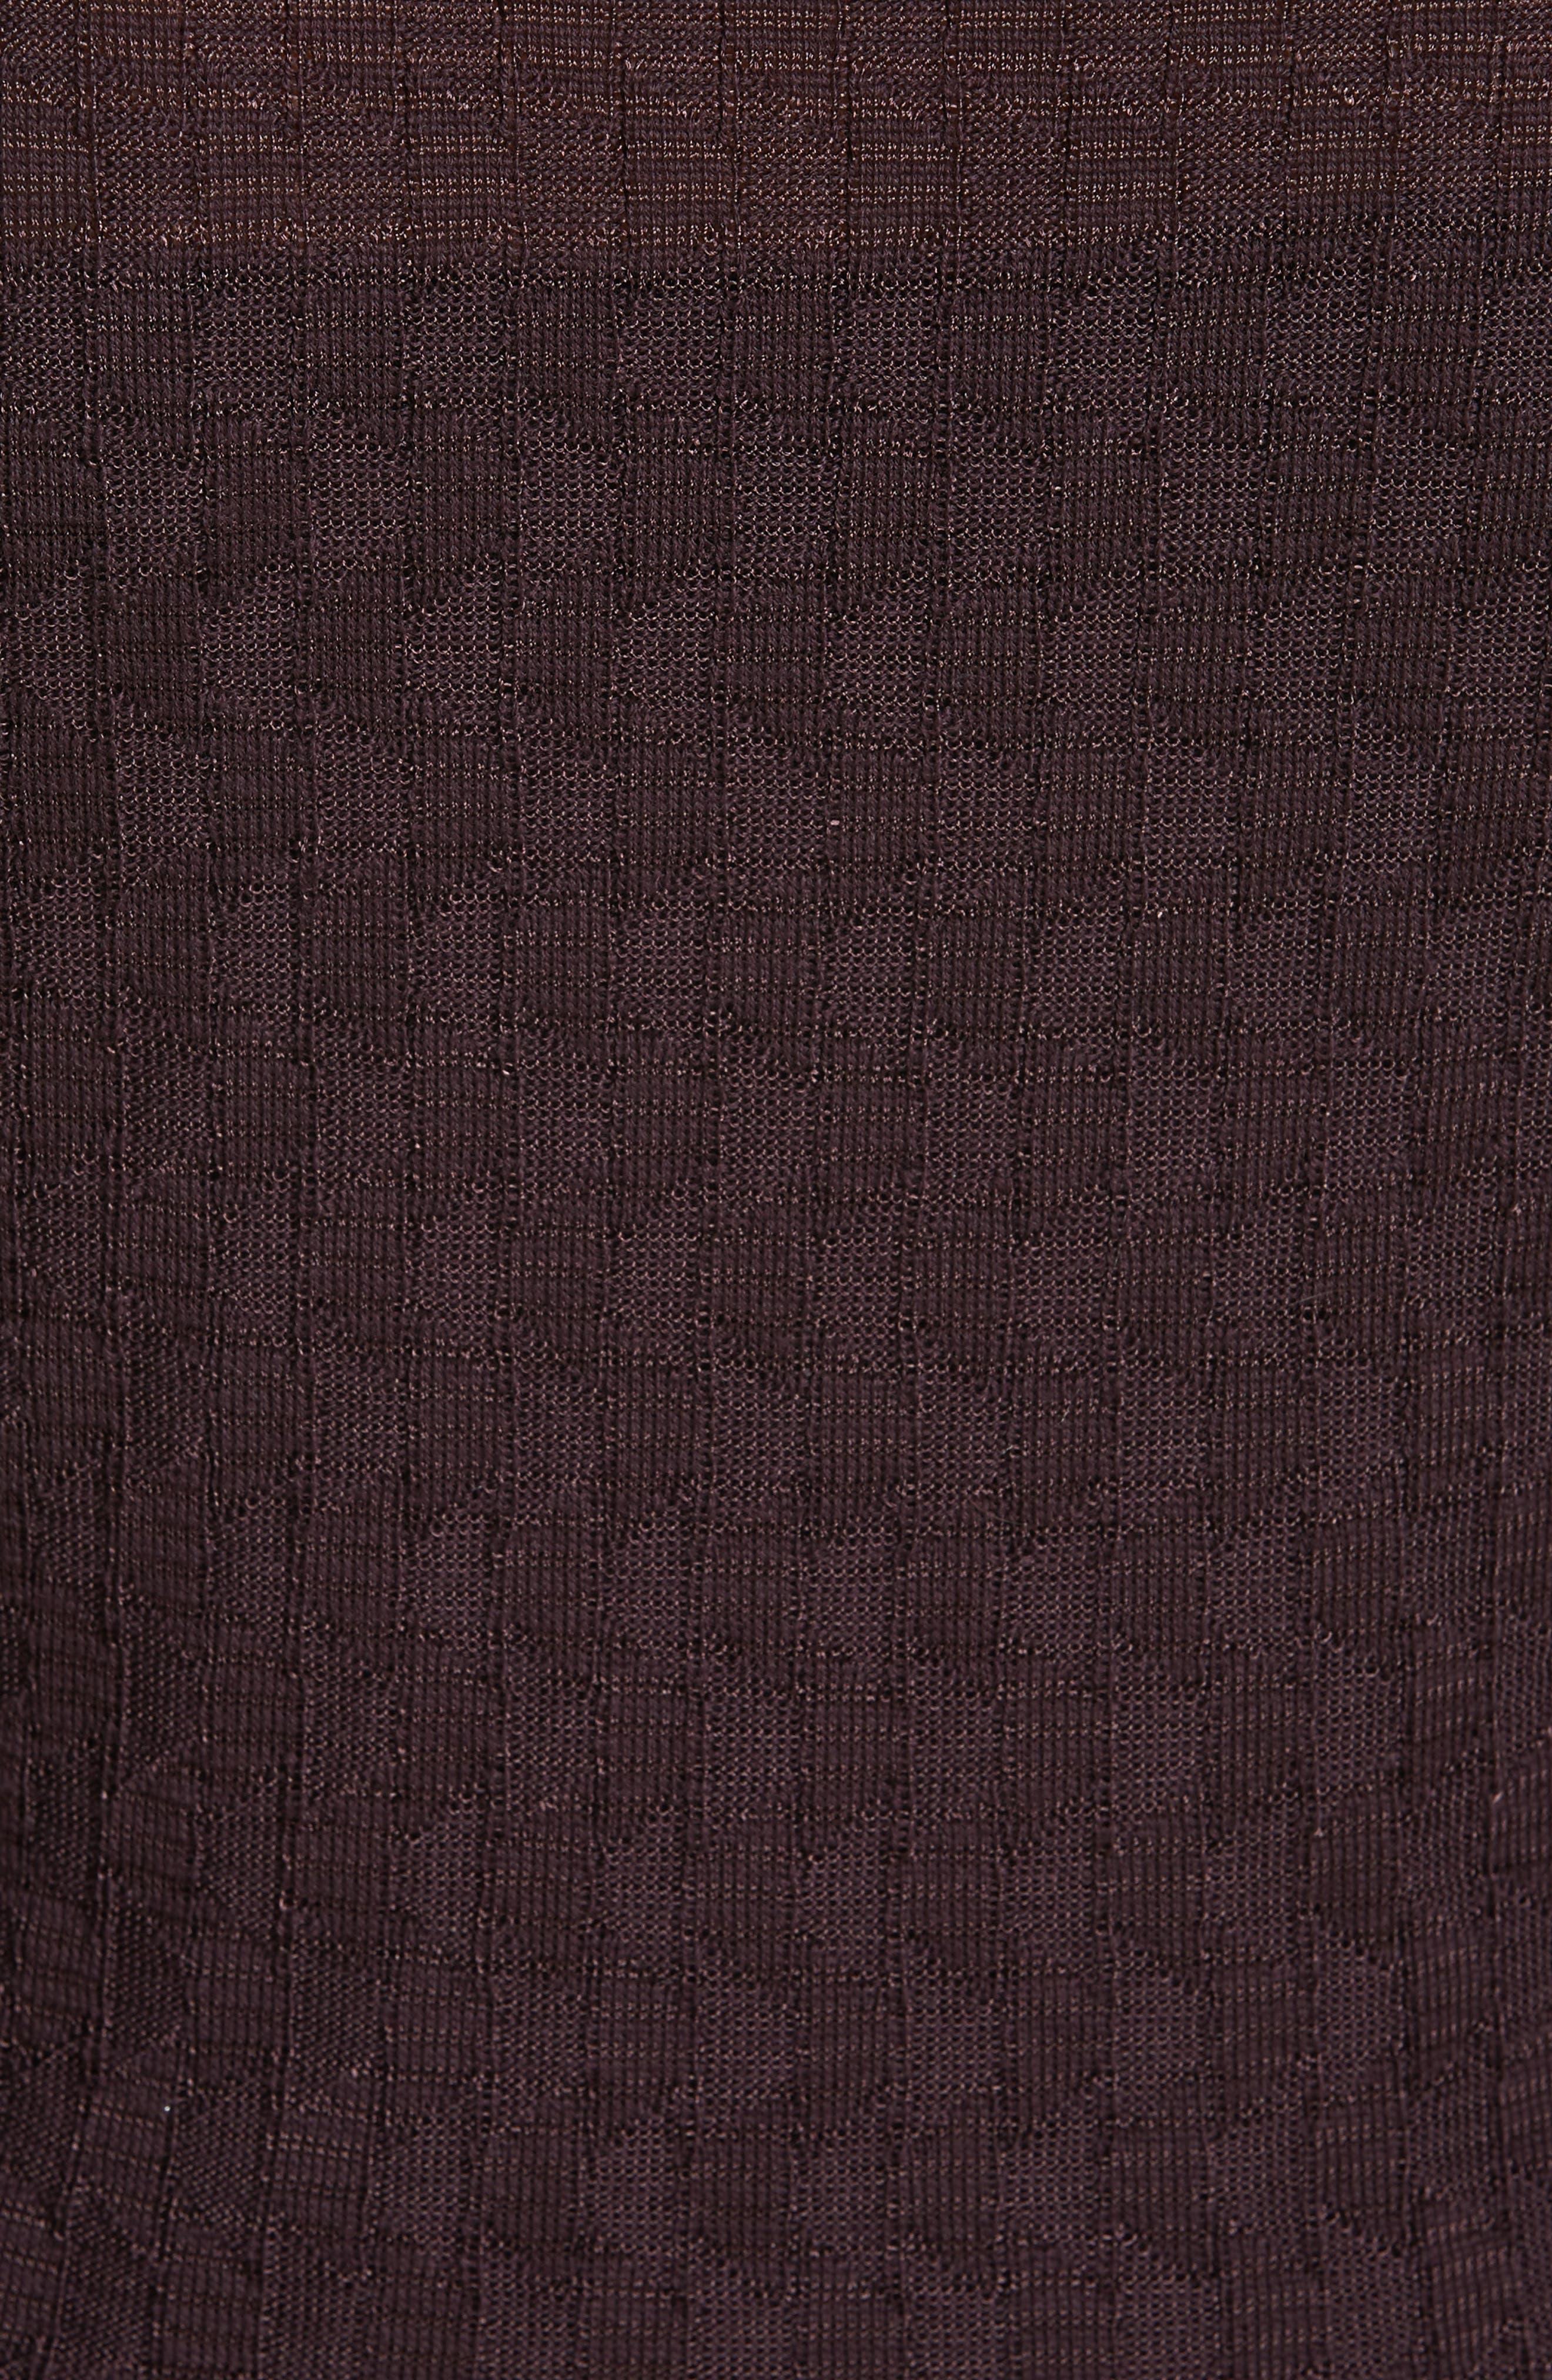 Wool Blend Knit A-Line Dress,                             Alternate thumbnail 5, color,                             570